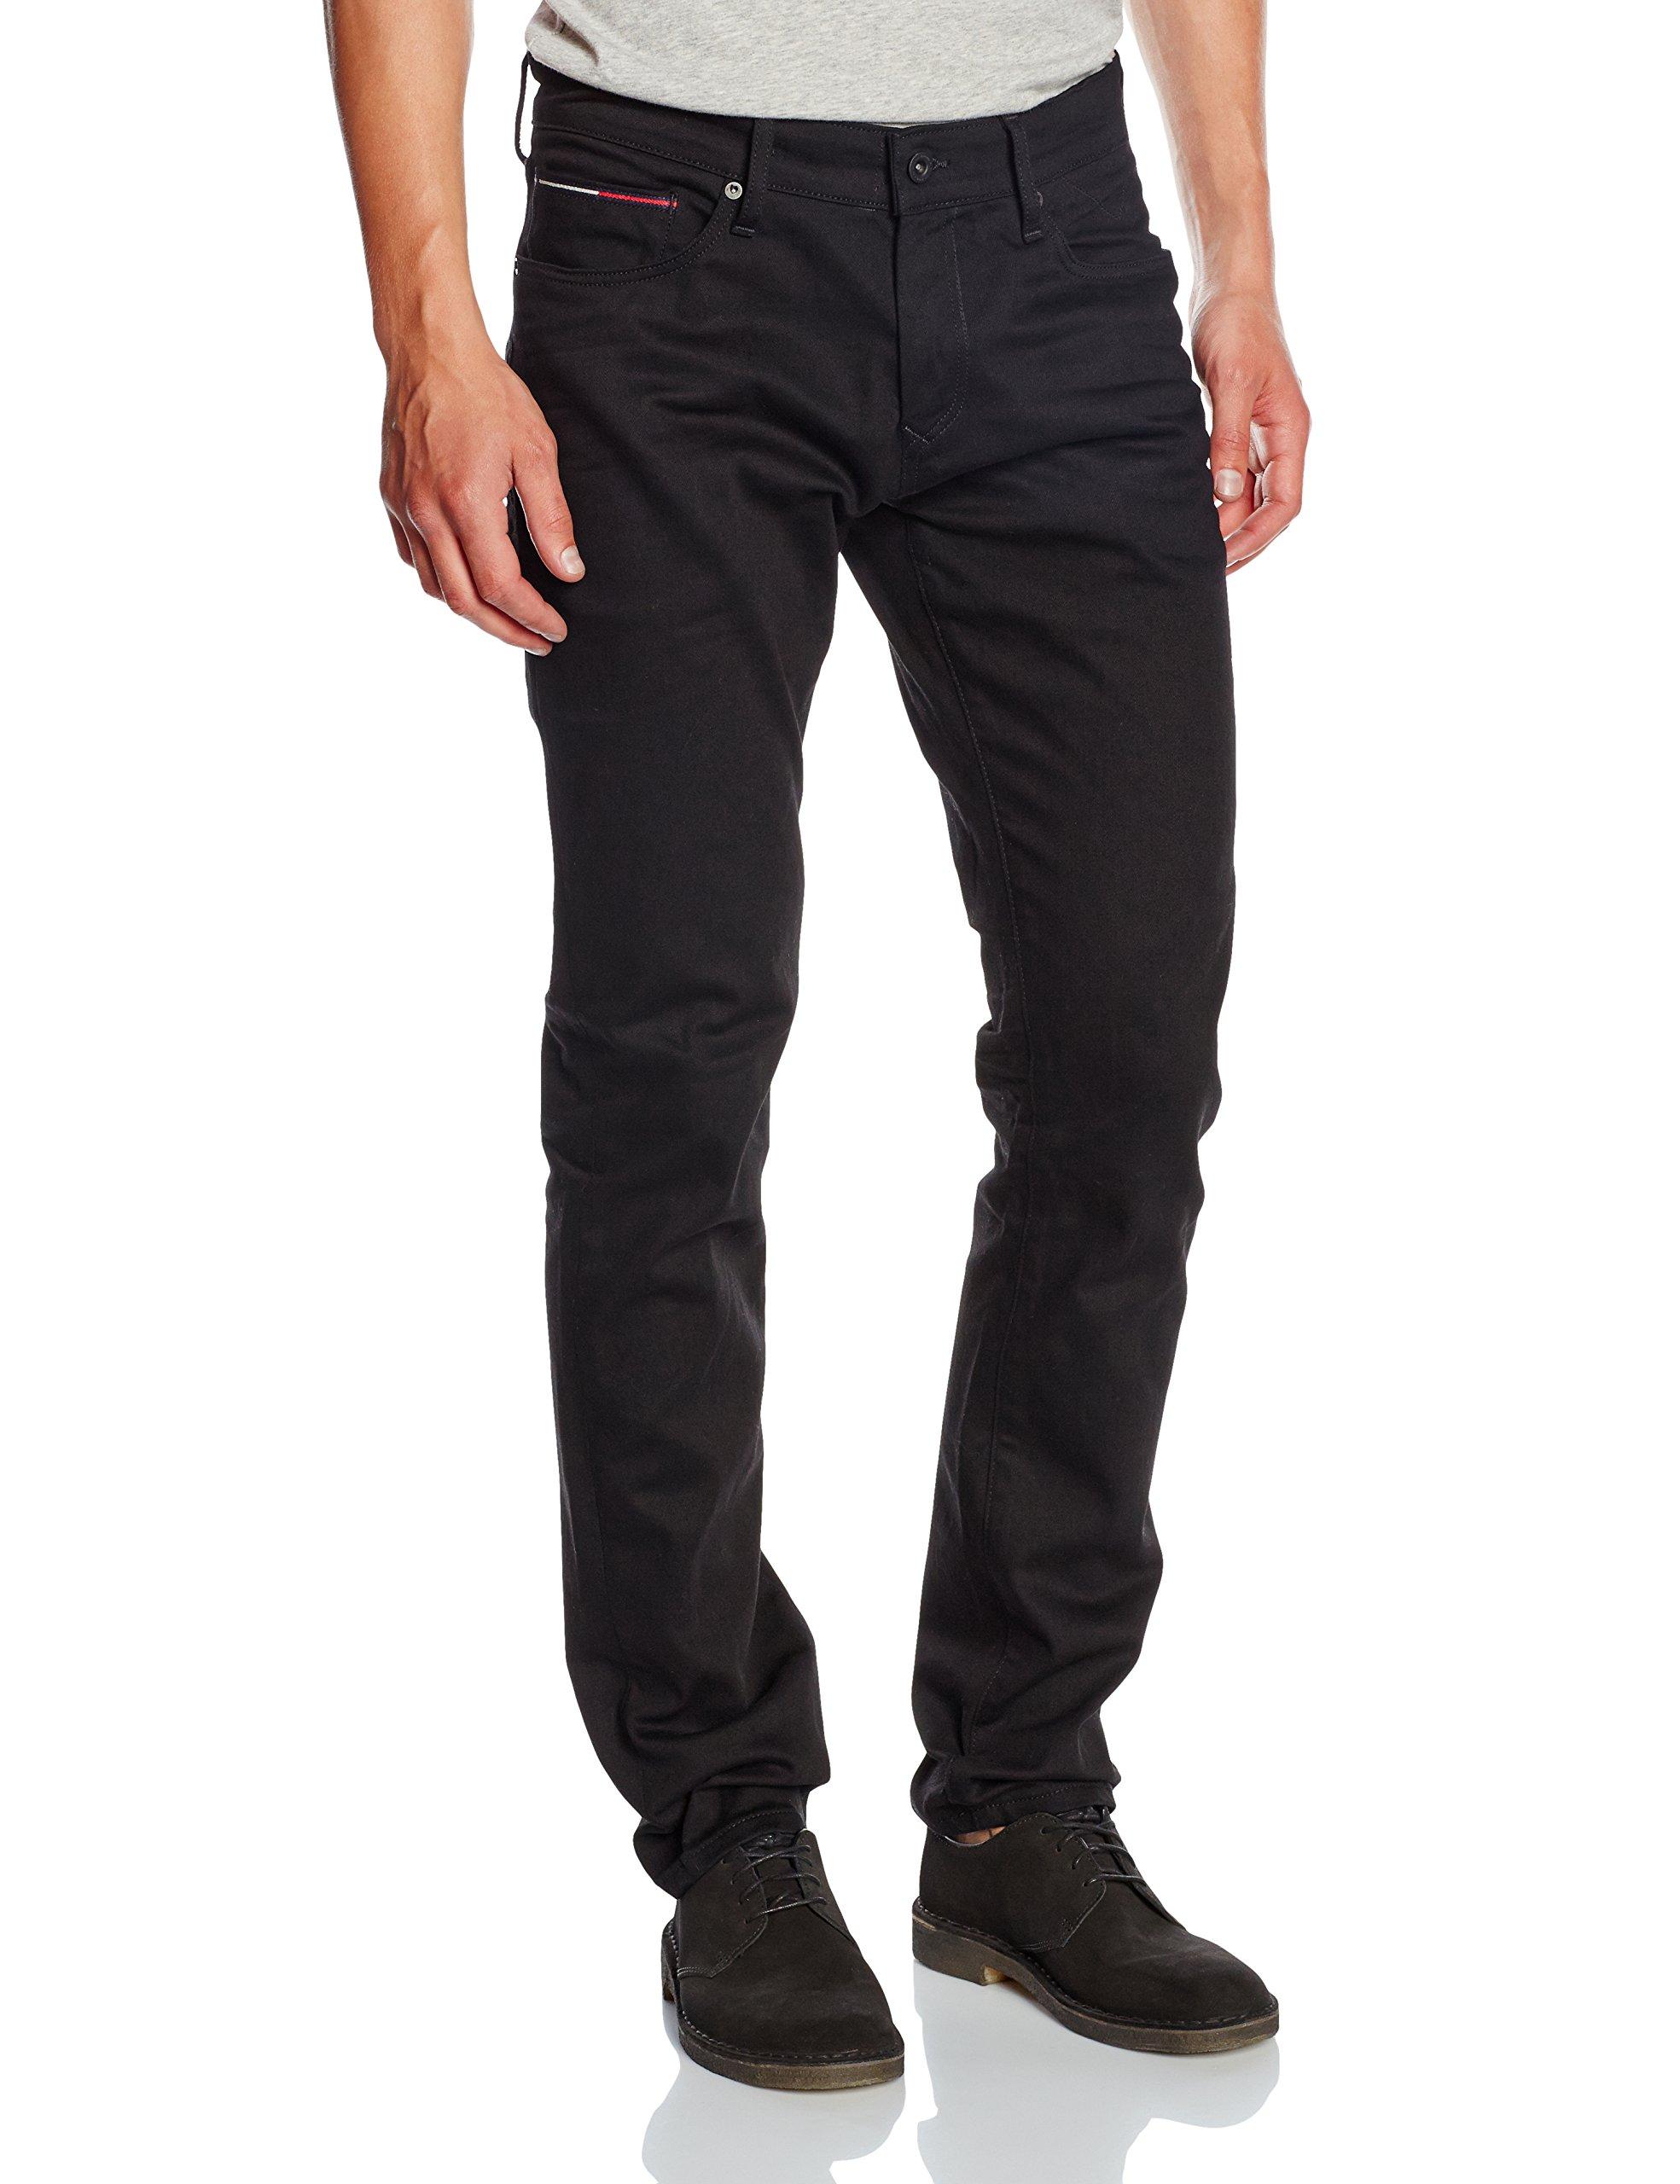 Tommy FabricantW31 Homme Jeans l32 Hilfiger Denim Slim Scanton JeansNoirblack ComfortTaille Blco GpqSUMVz